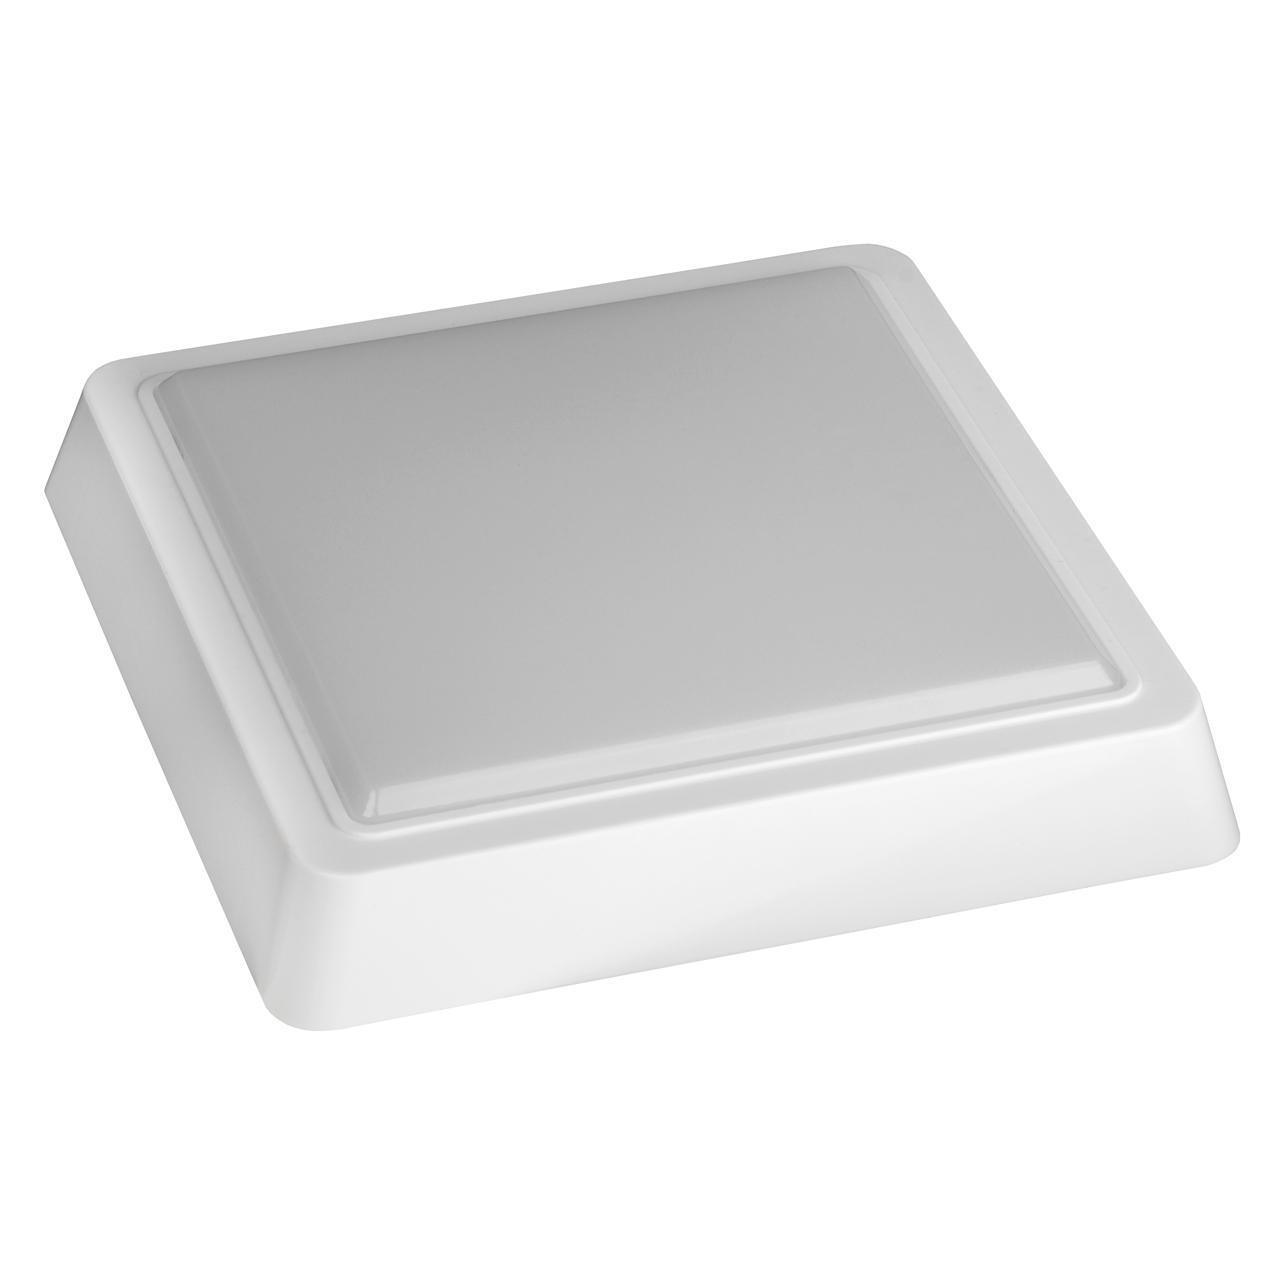 цена на Настенно-потолочный светильник Эра SPB-4-05-4K, LED, 5 Вт